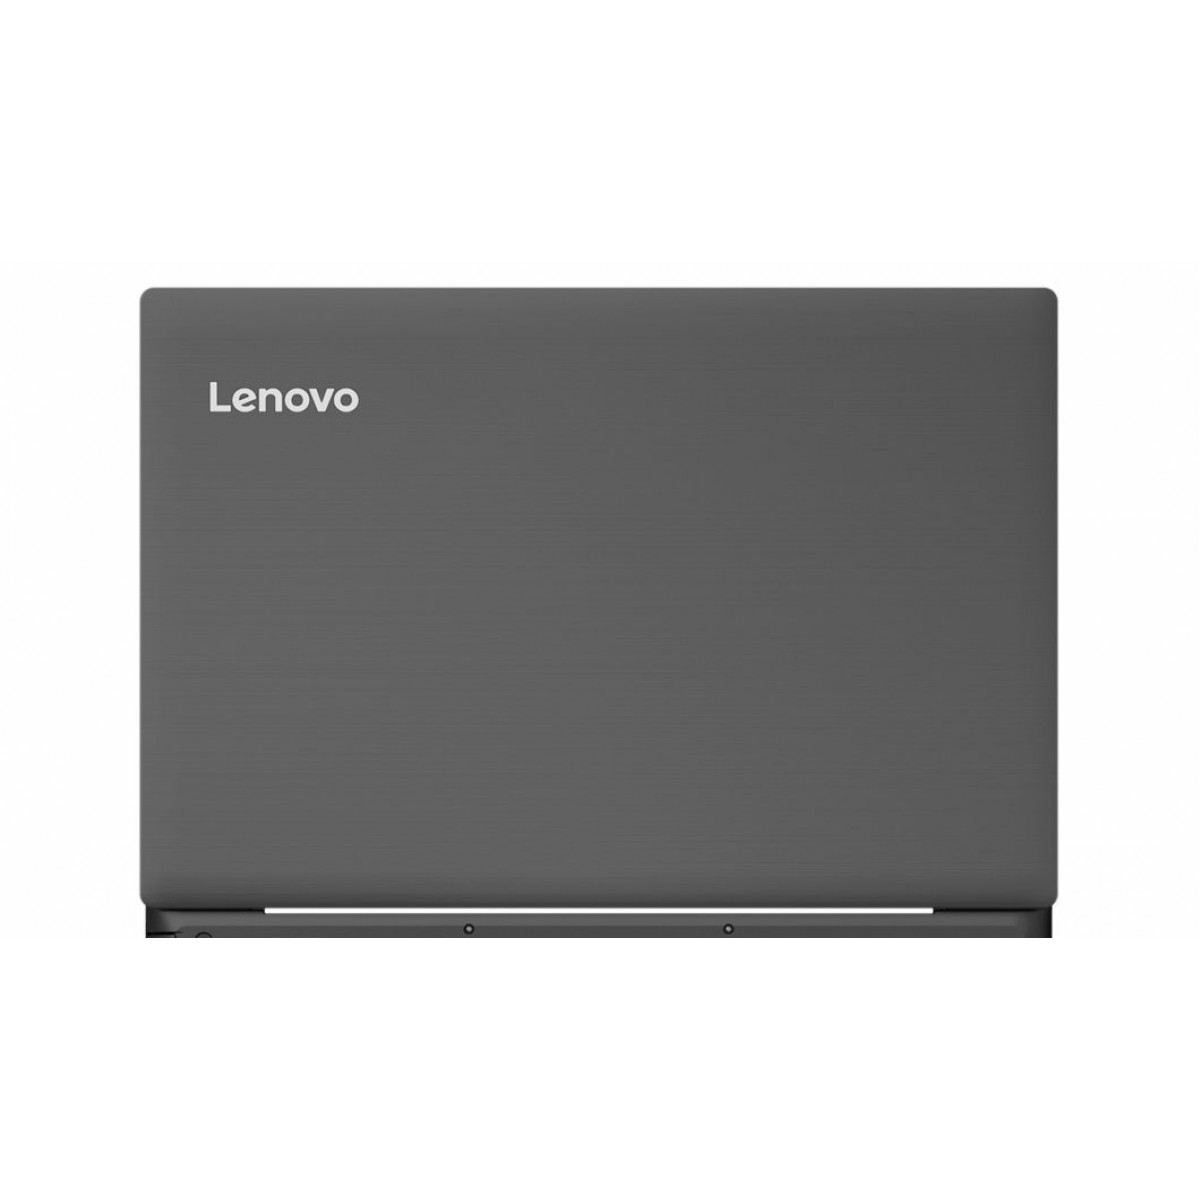 Notebook Lenovo V330 i7 8550U 4G SSD256GB 15.6 Free